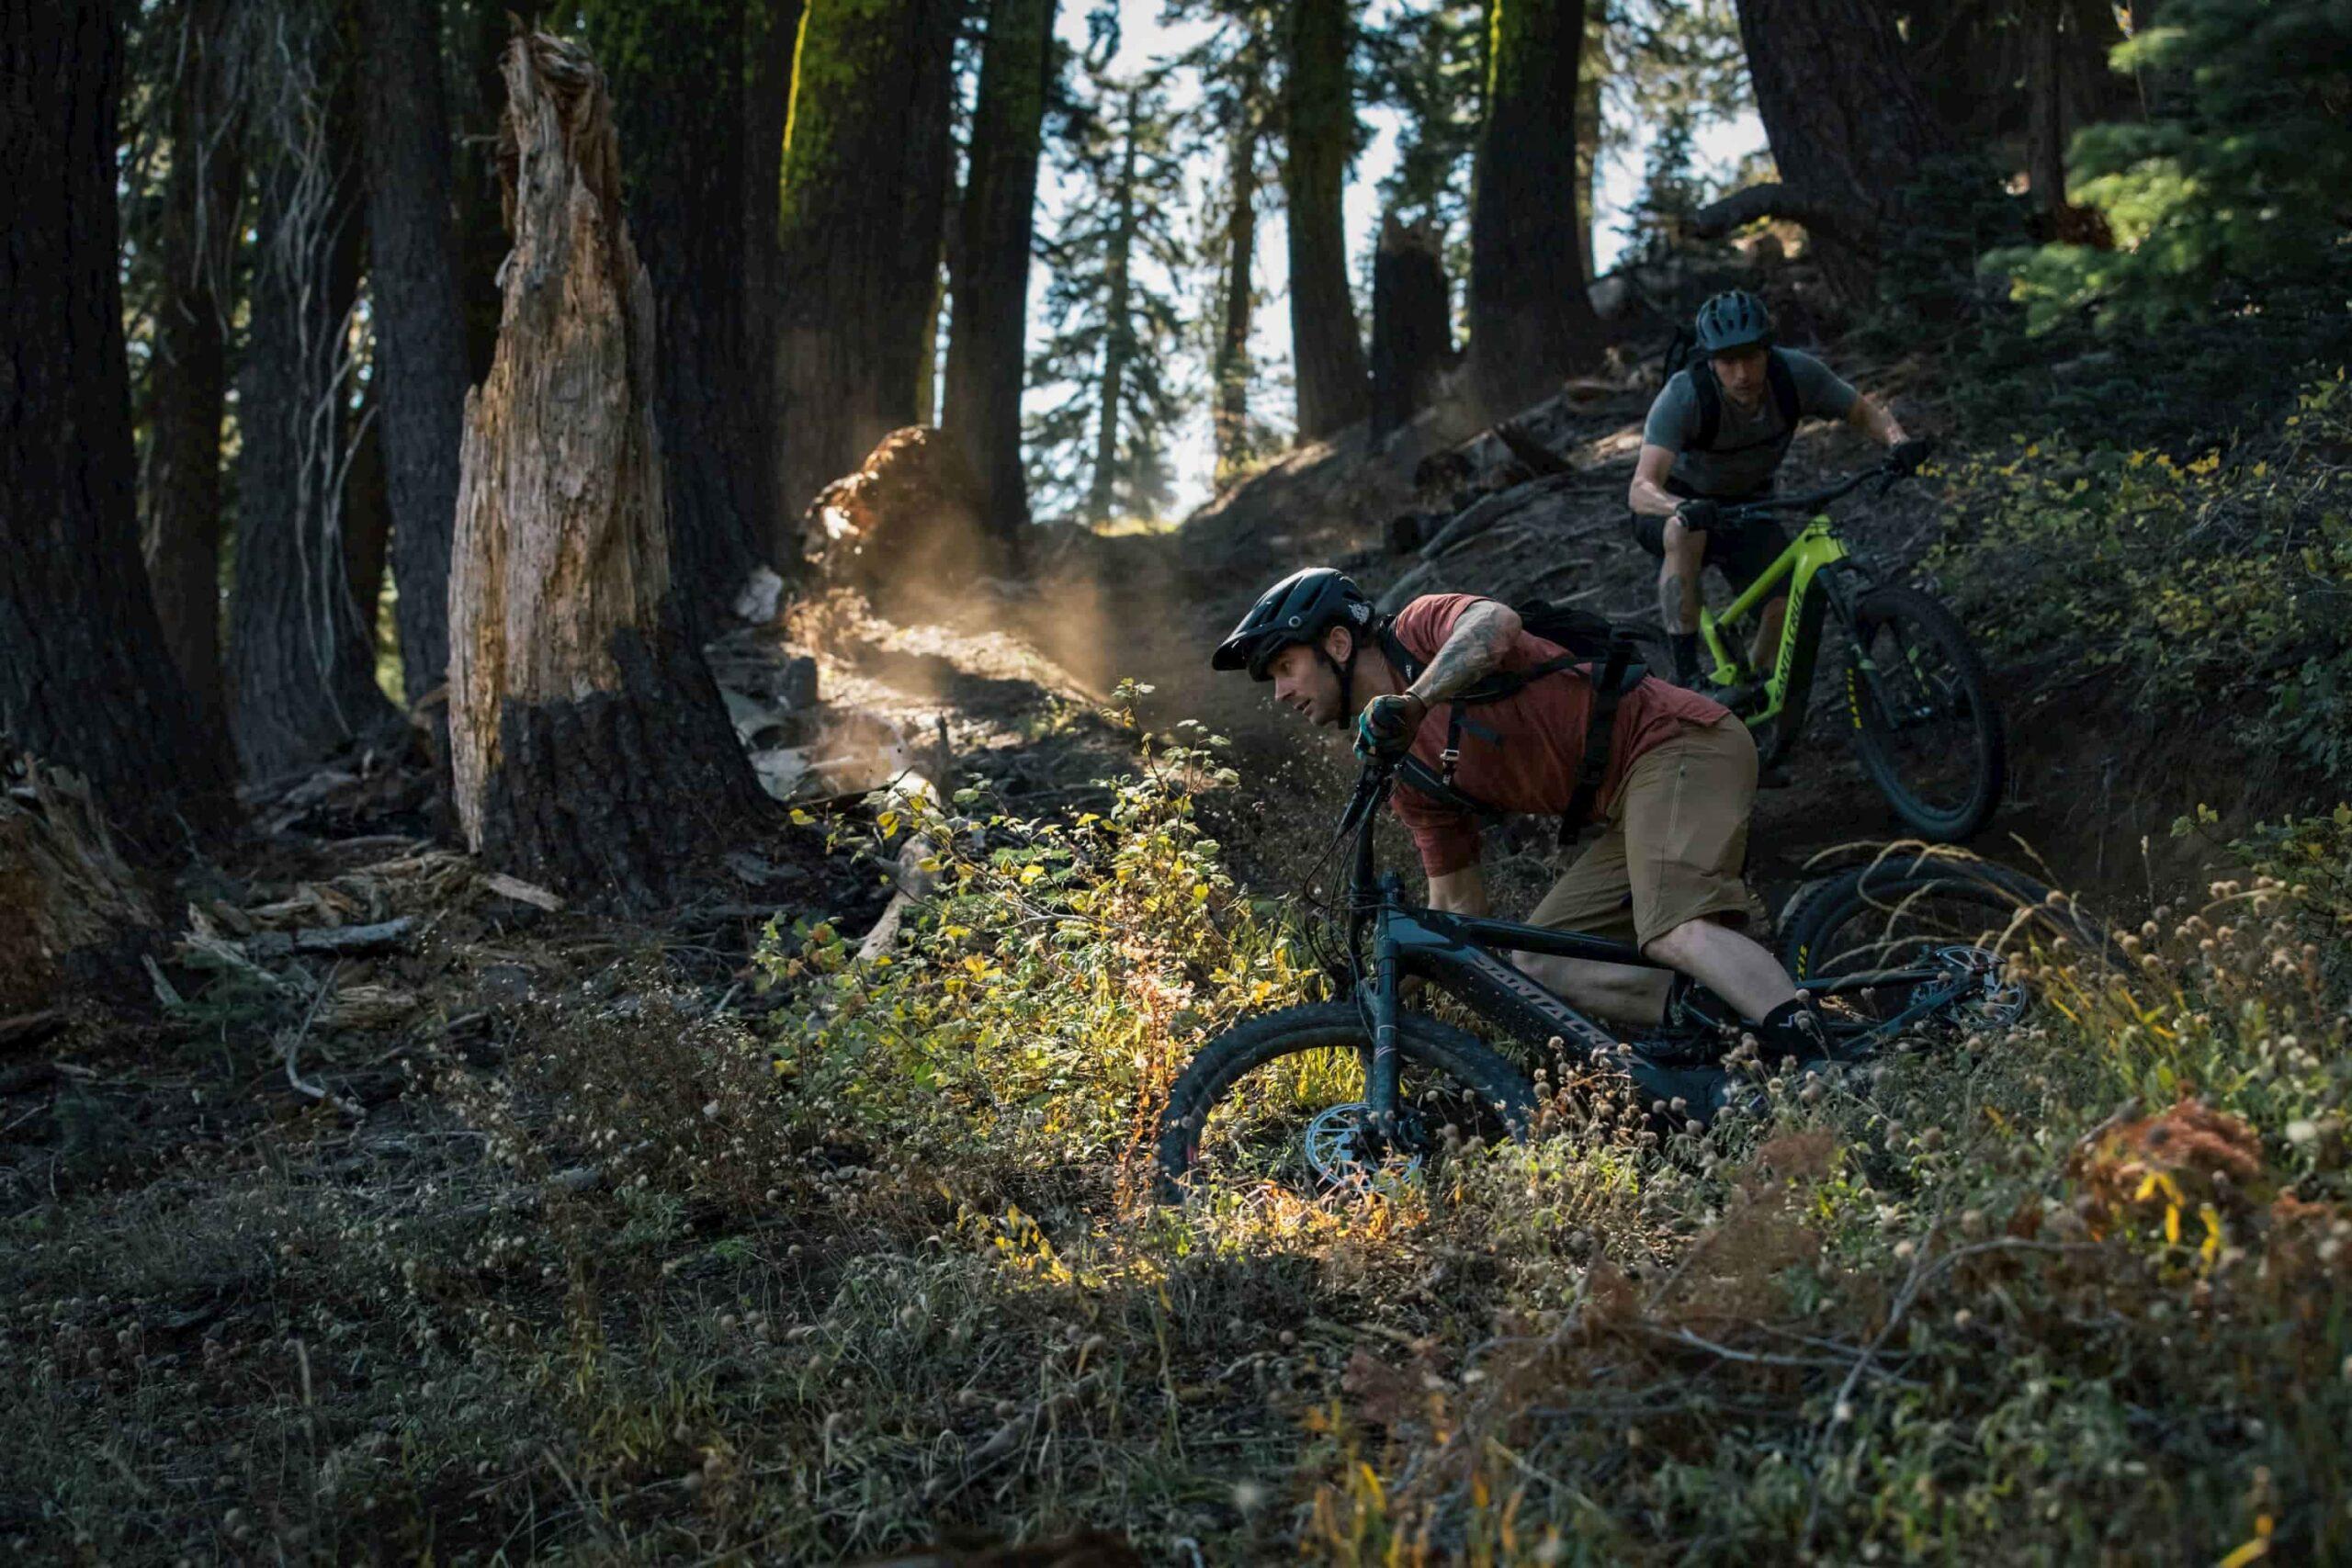 Santa Cruz E-Bikes Classes, Motors, and Batteries